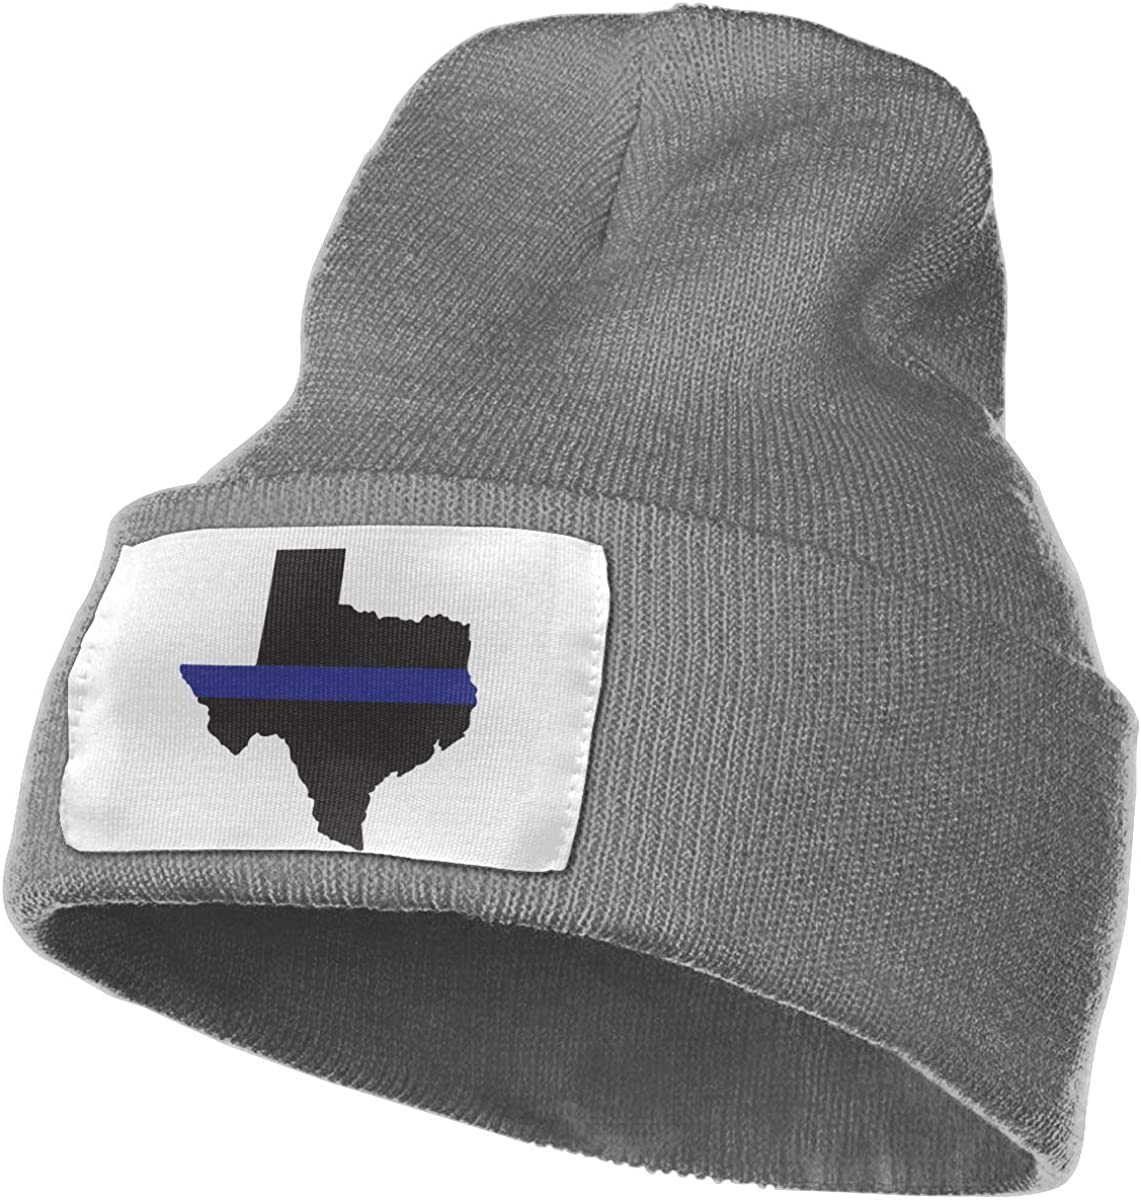 Adults Texas Thin Blue Line Elastic Knitted Beanie Cap Winter Warm Skull Hats